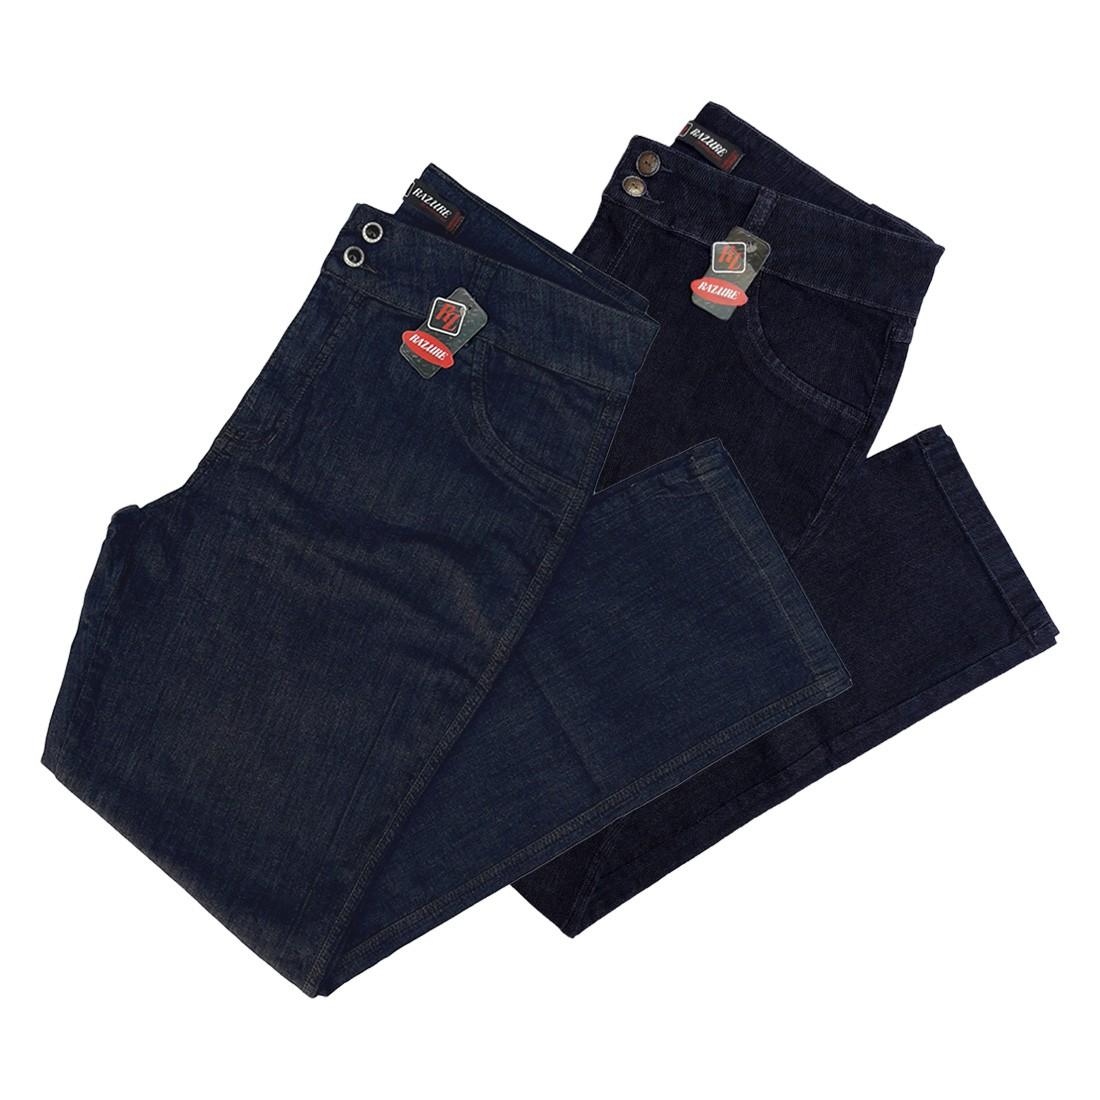 Kit C/02 Calças Jeans Femininas Cint Alta Plus Size 52 E 54